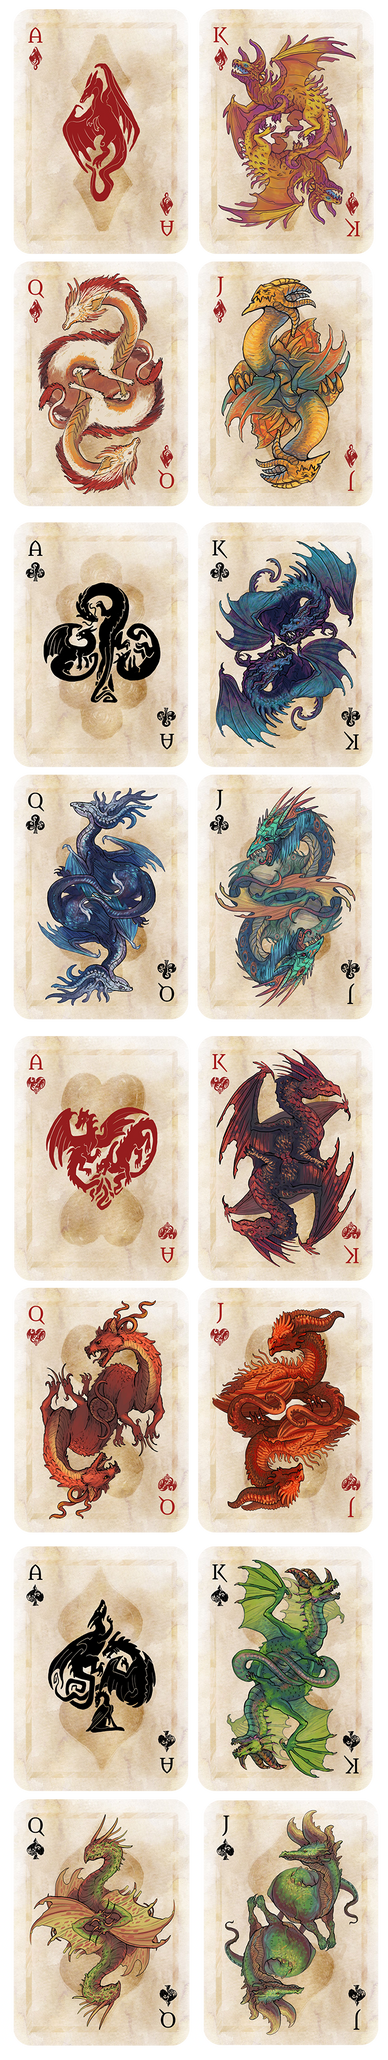 Draconic playing cards Kickstarter by Nimphradora